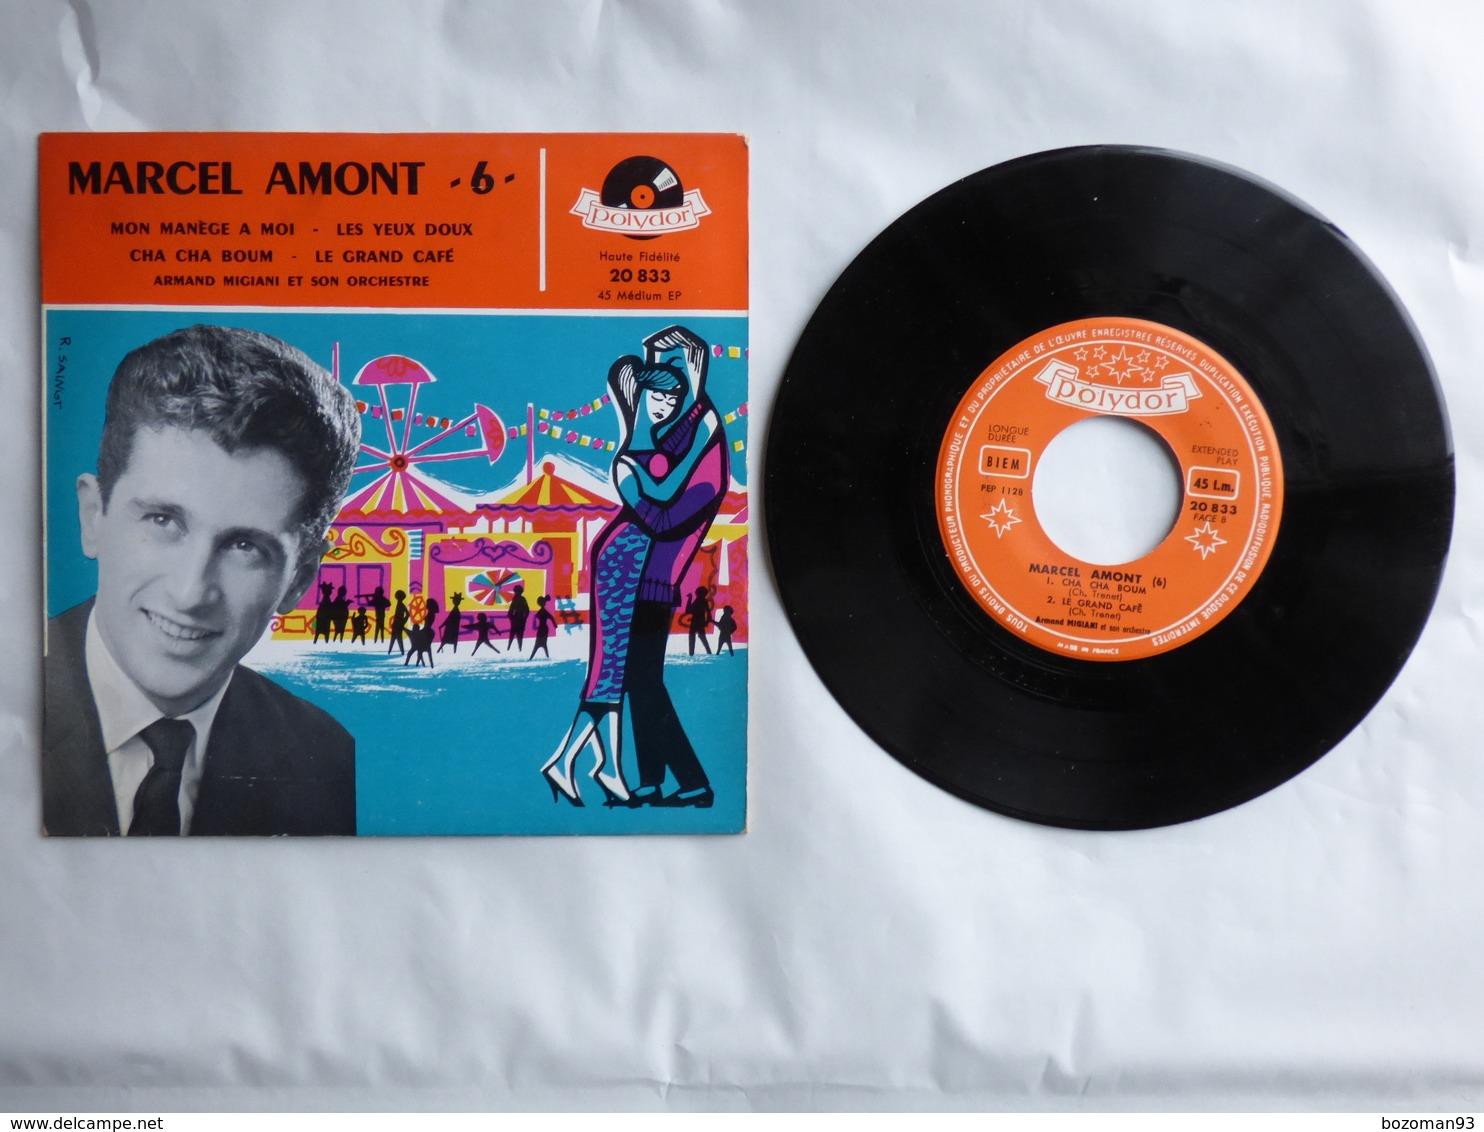 EP 45T MARCEL AMONT  LABEL POLYDOR 20.833  MON MANEGE A MOI - LE GRAND CAFE - Disco, Pop